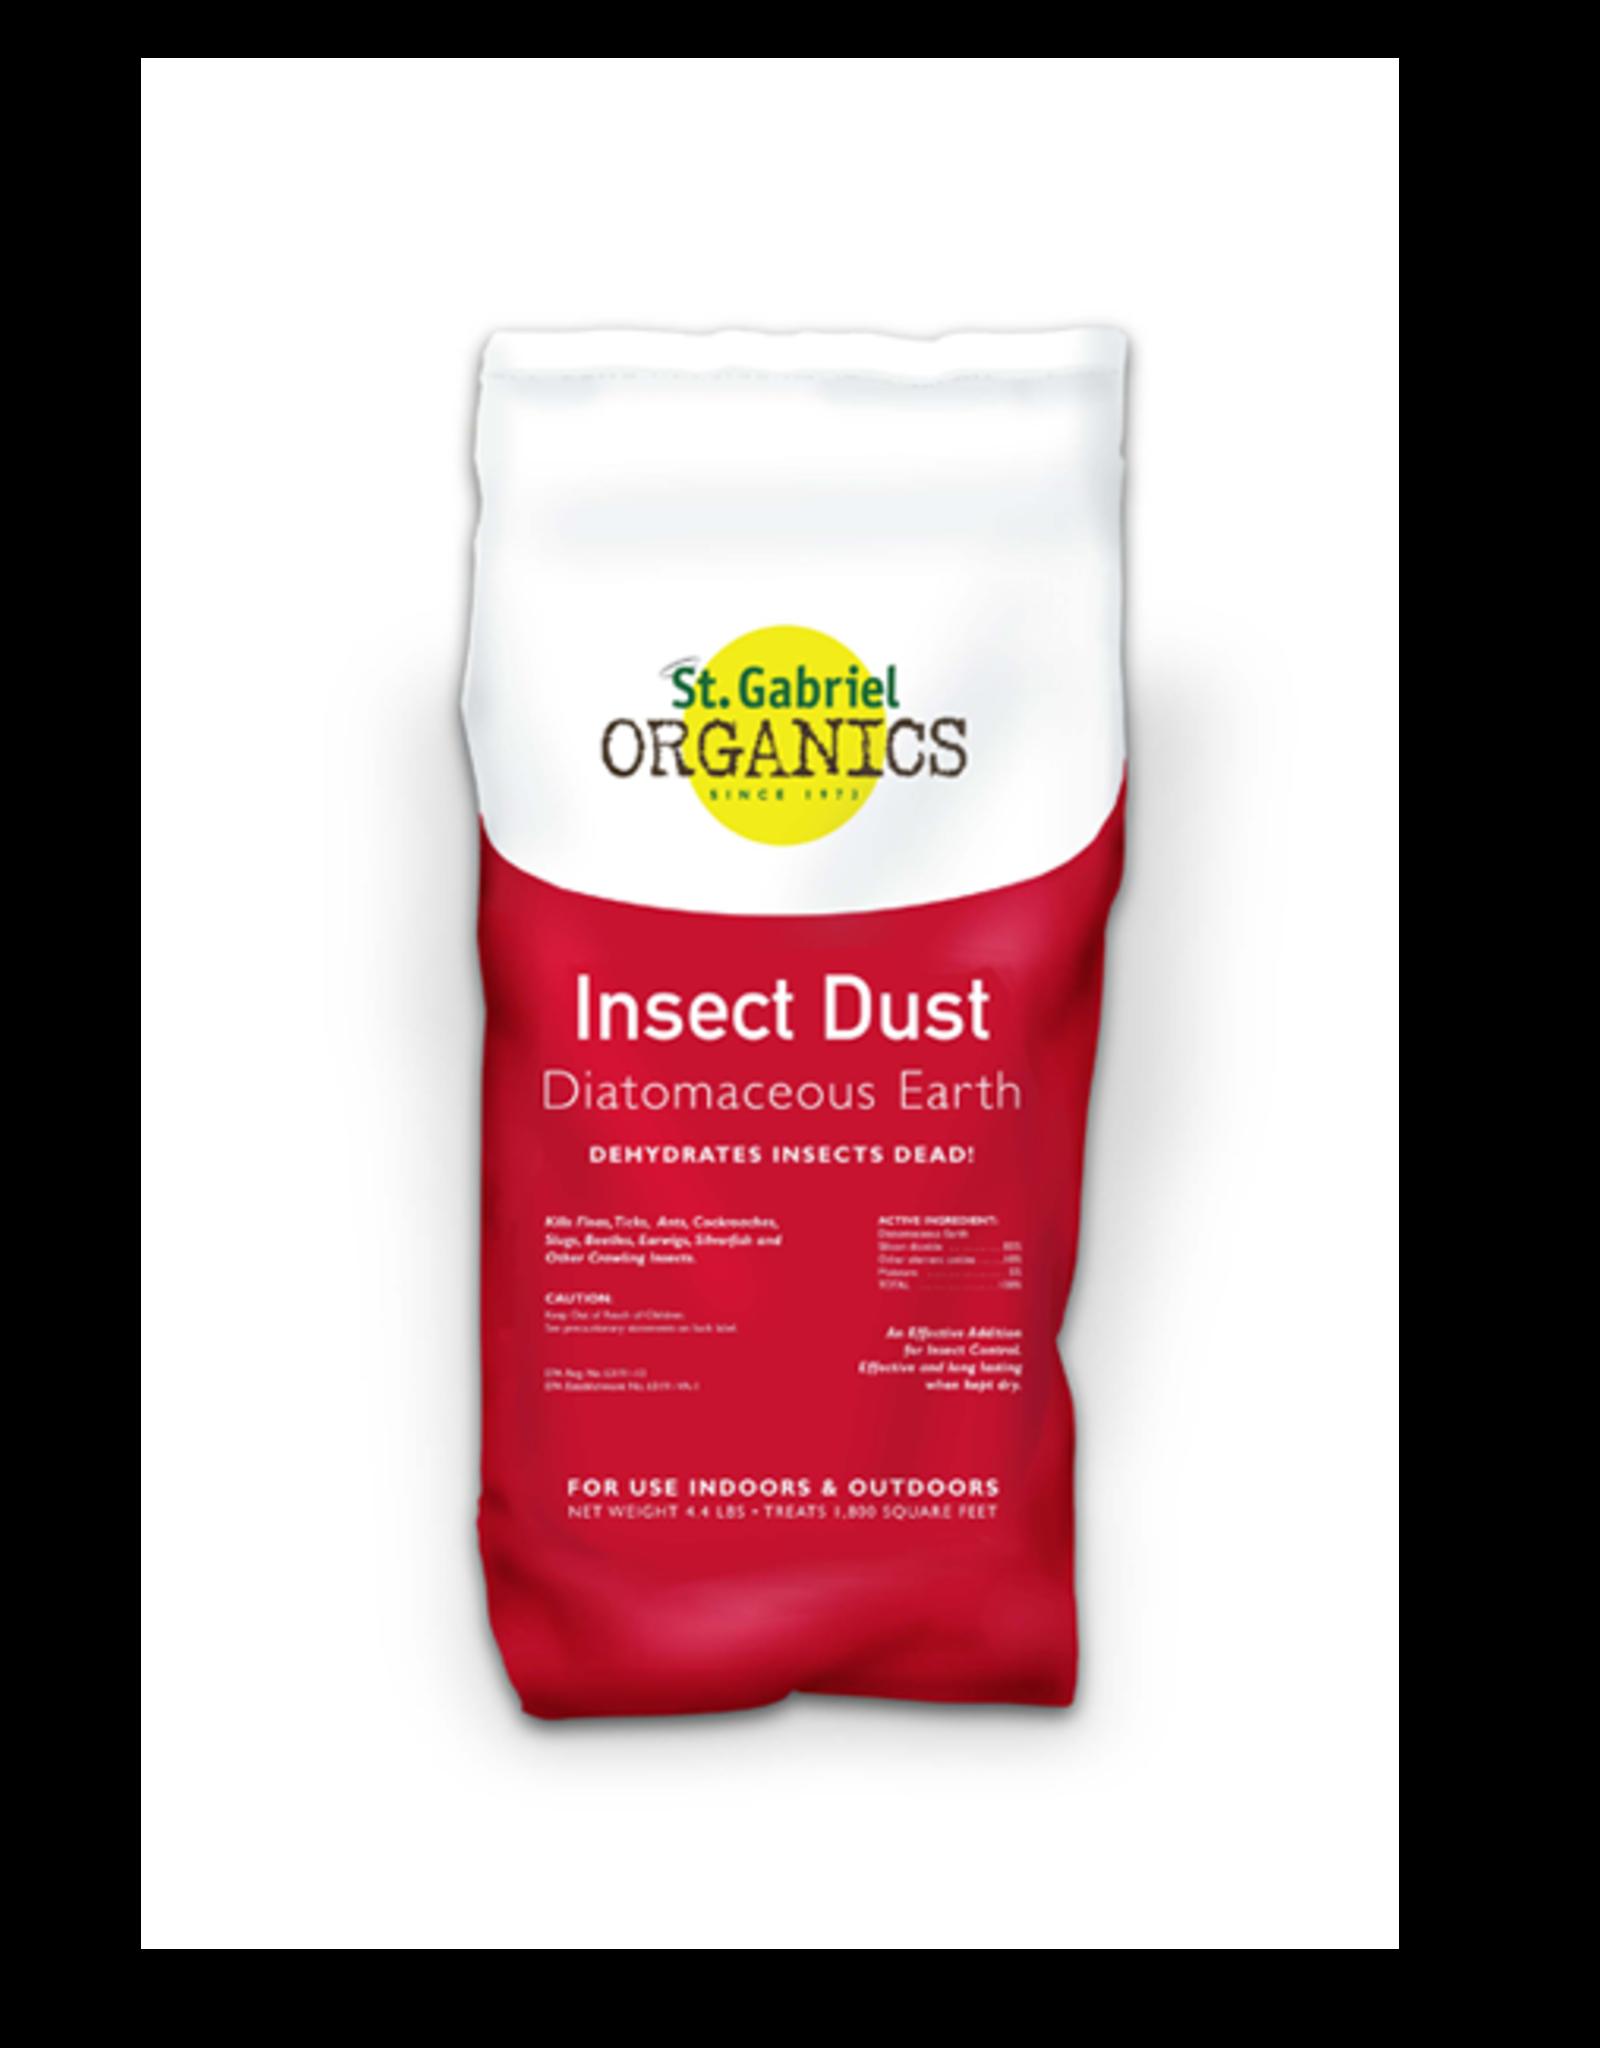 St. Gabriel Organics Diatomaceous Earth Insect Dust 4.4lb